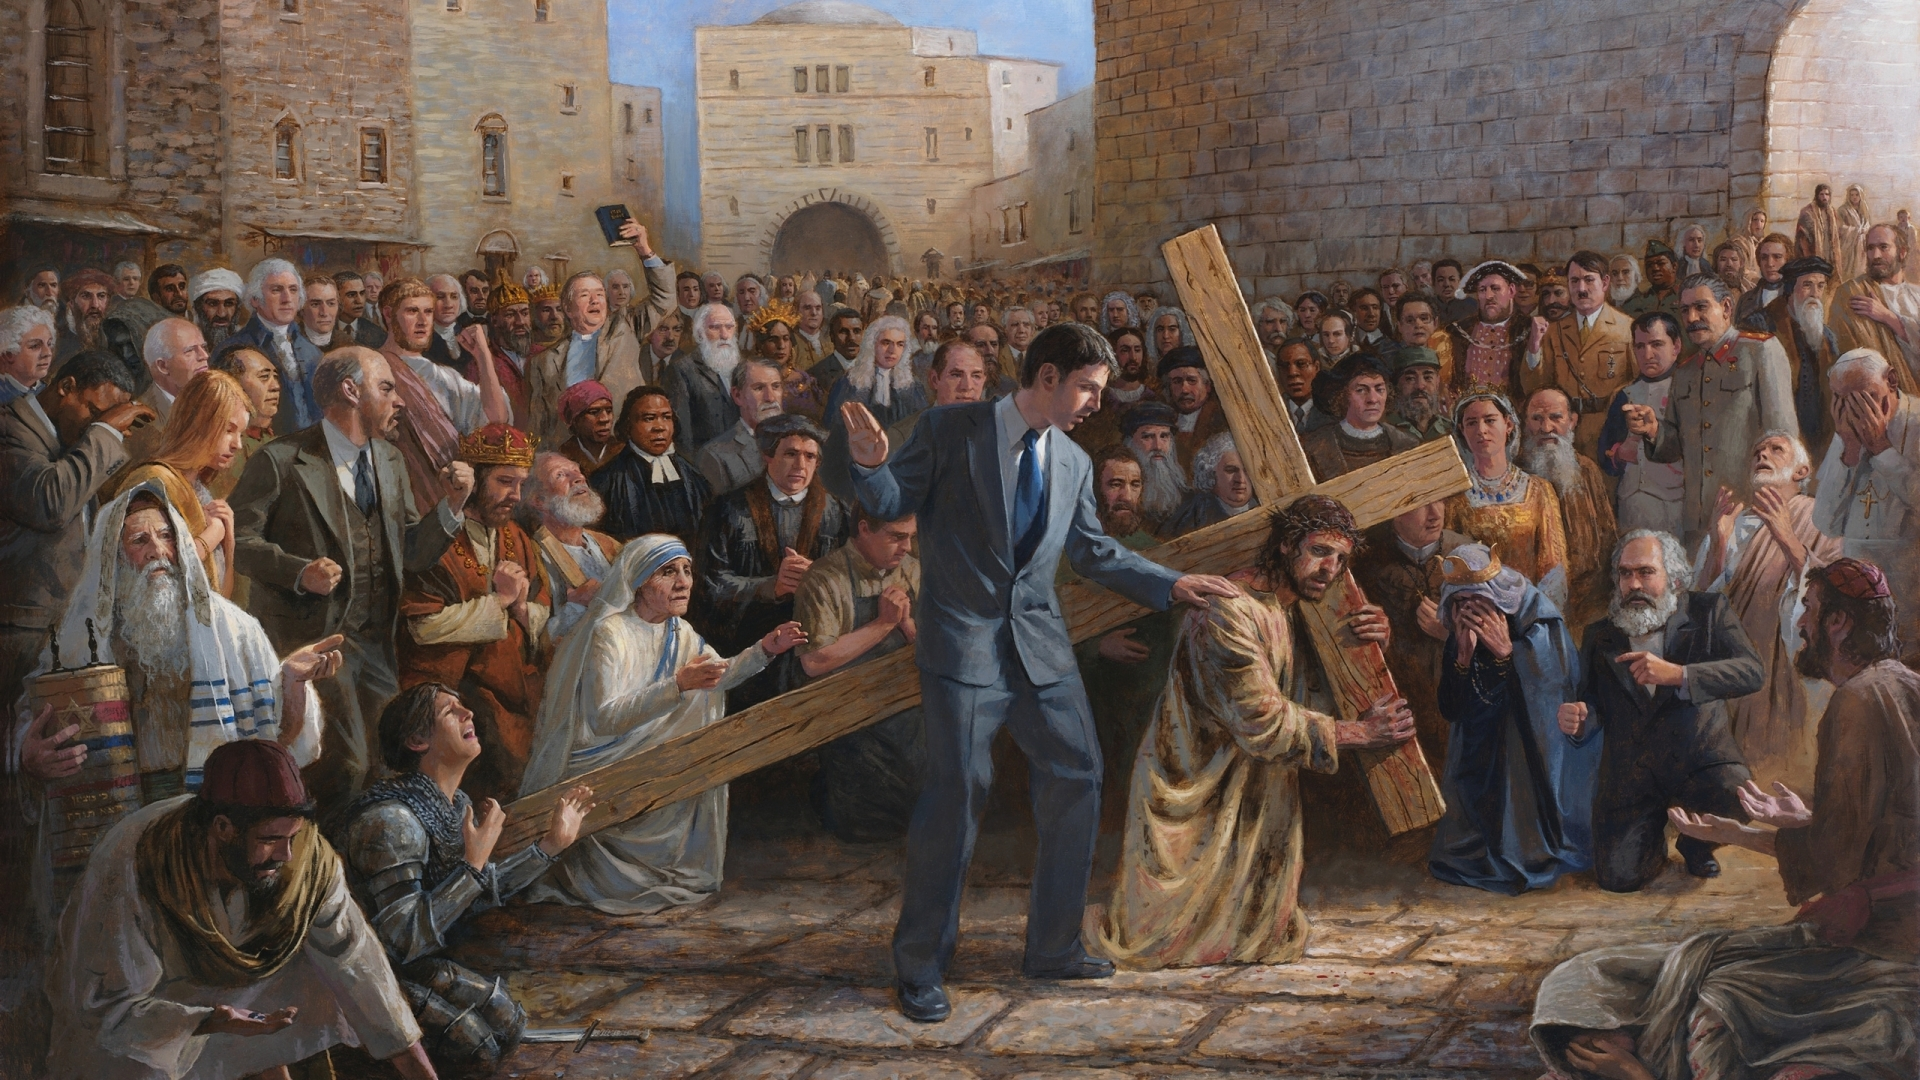 jesus christ widescreen wallpapers - photo #30